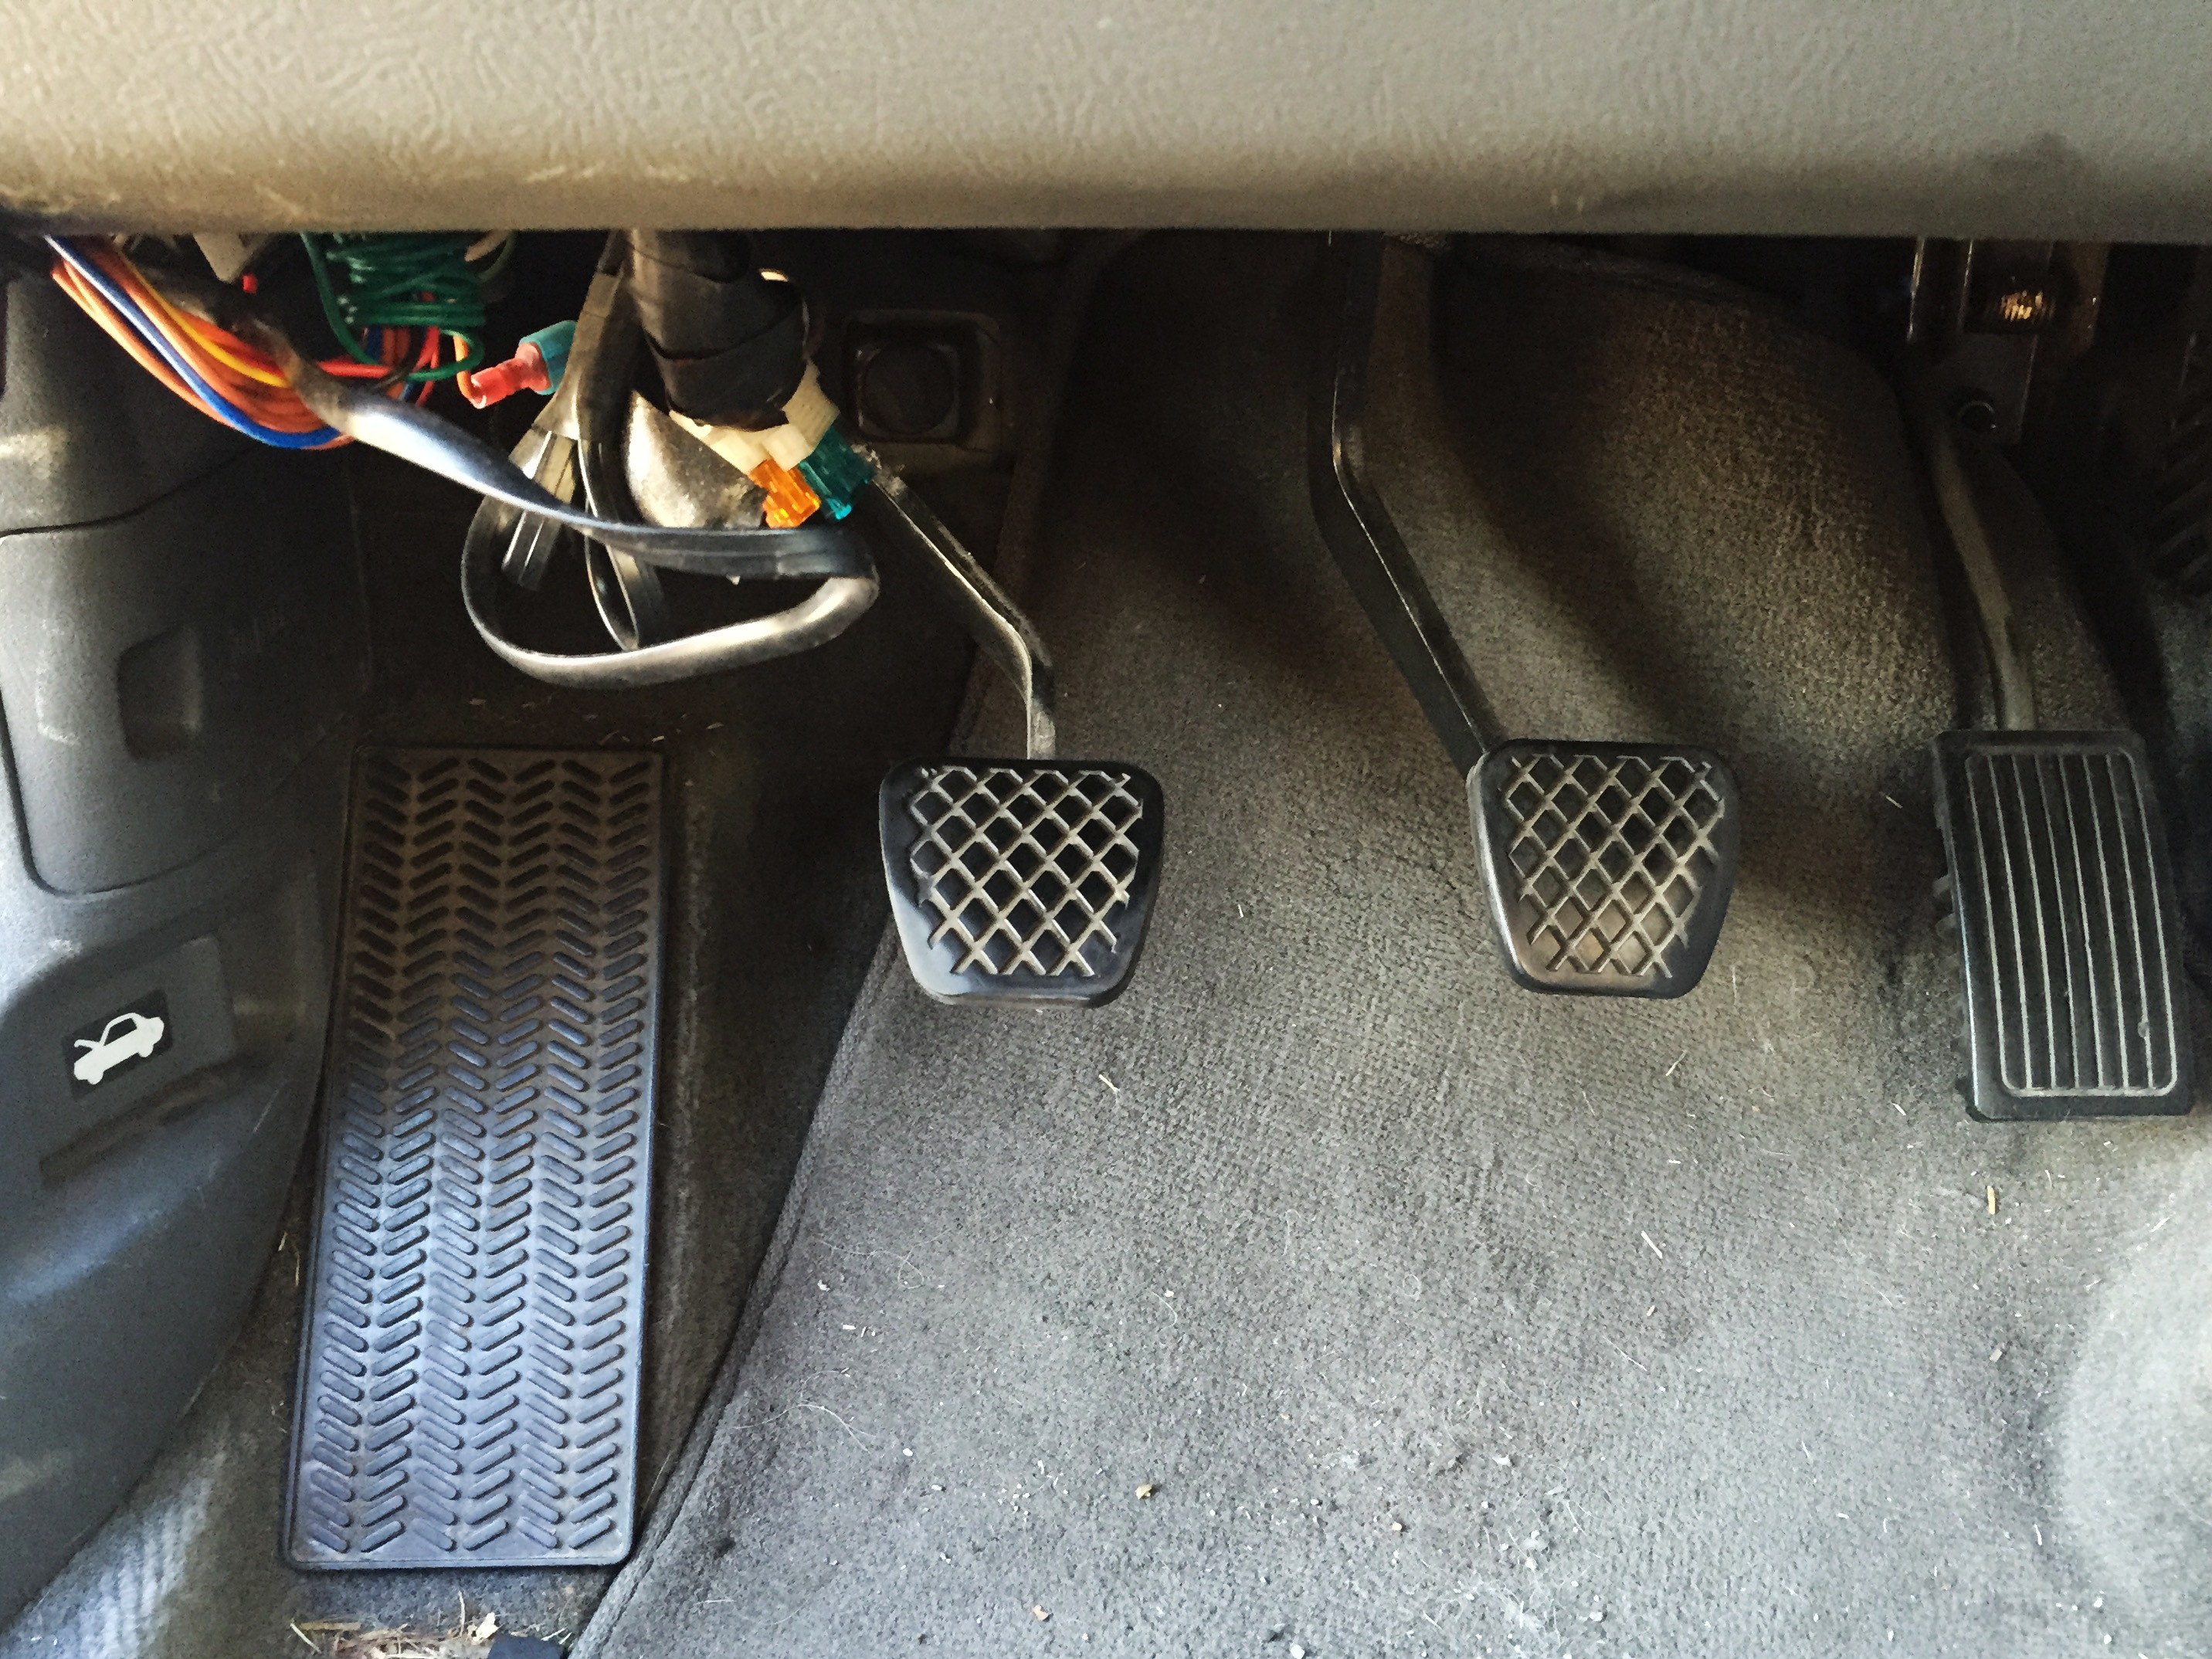 2003 2007 Honda Accord Repair 2004 2005 2006 Ifixit 2002 Civic Srs Wire Diagram Battery